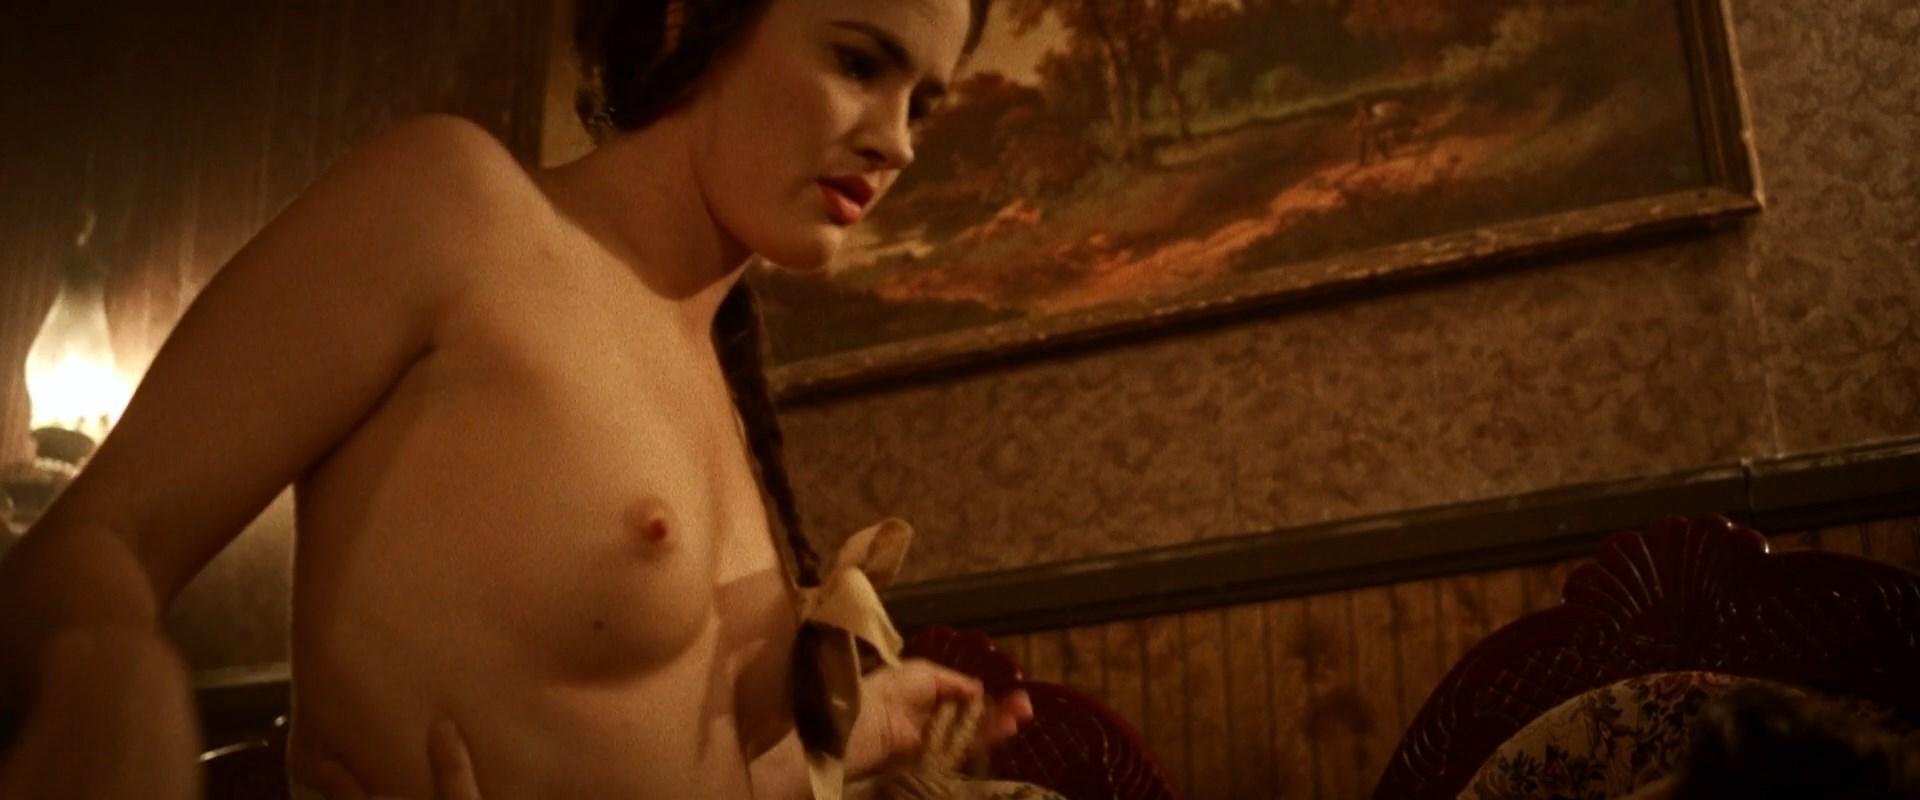 Anna Borchert nude - West of Hell (2018)